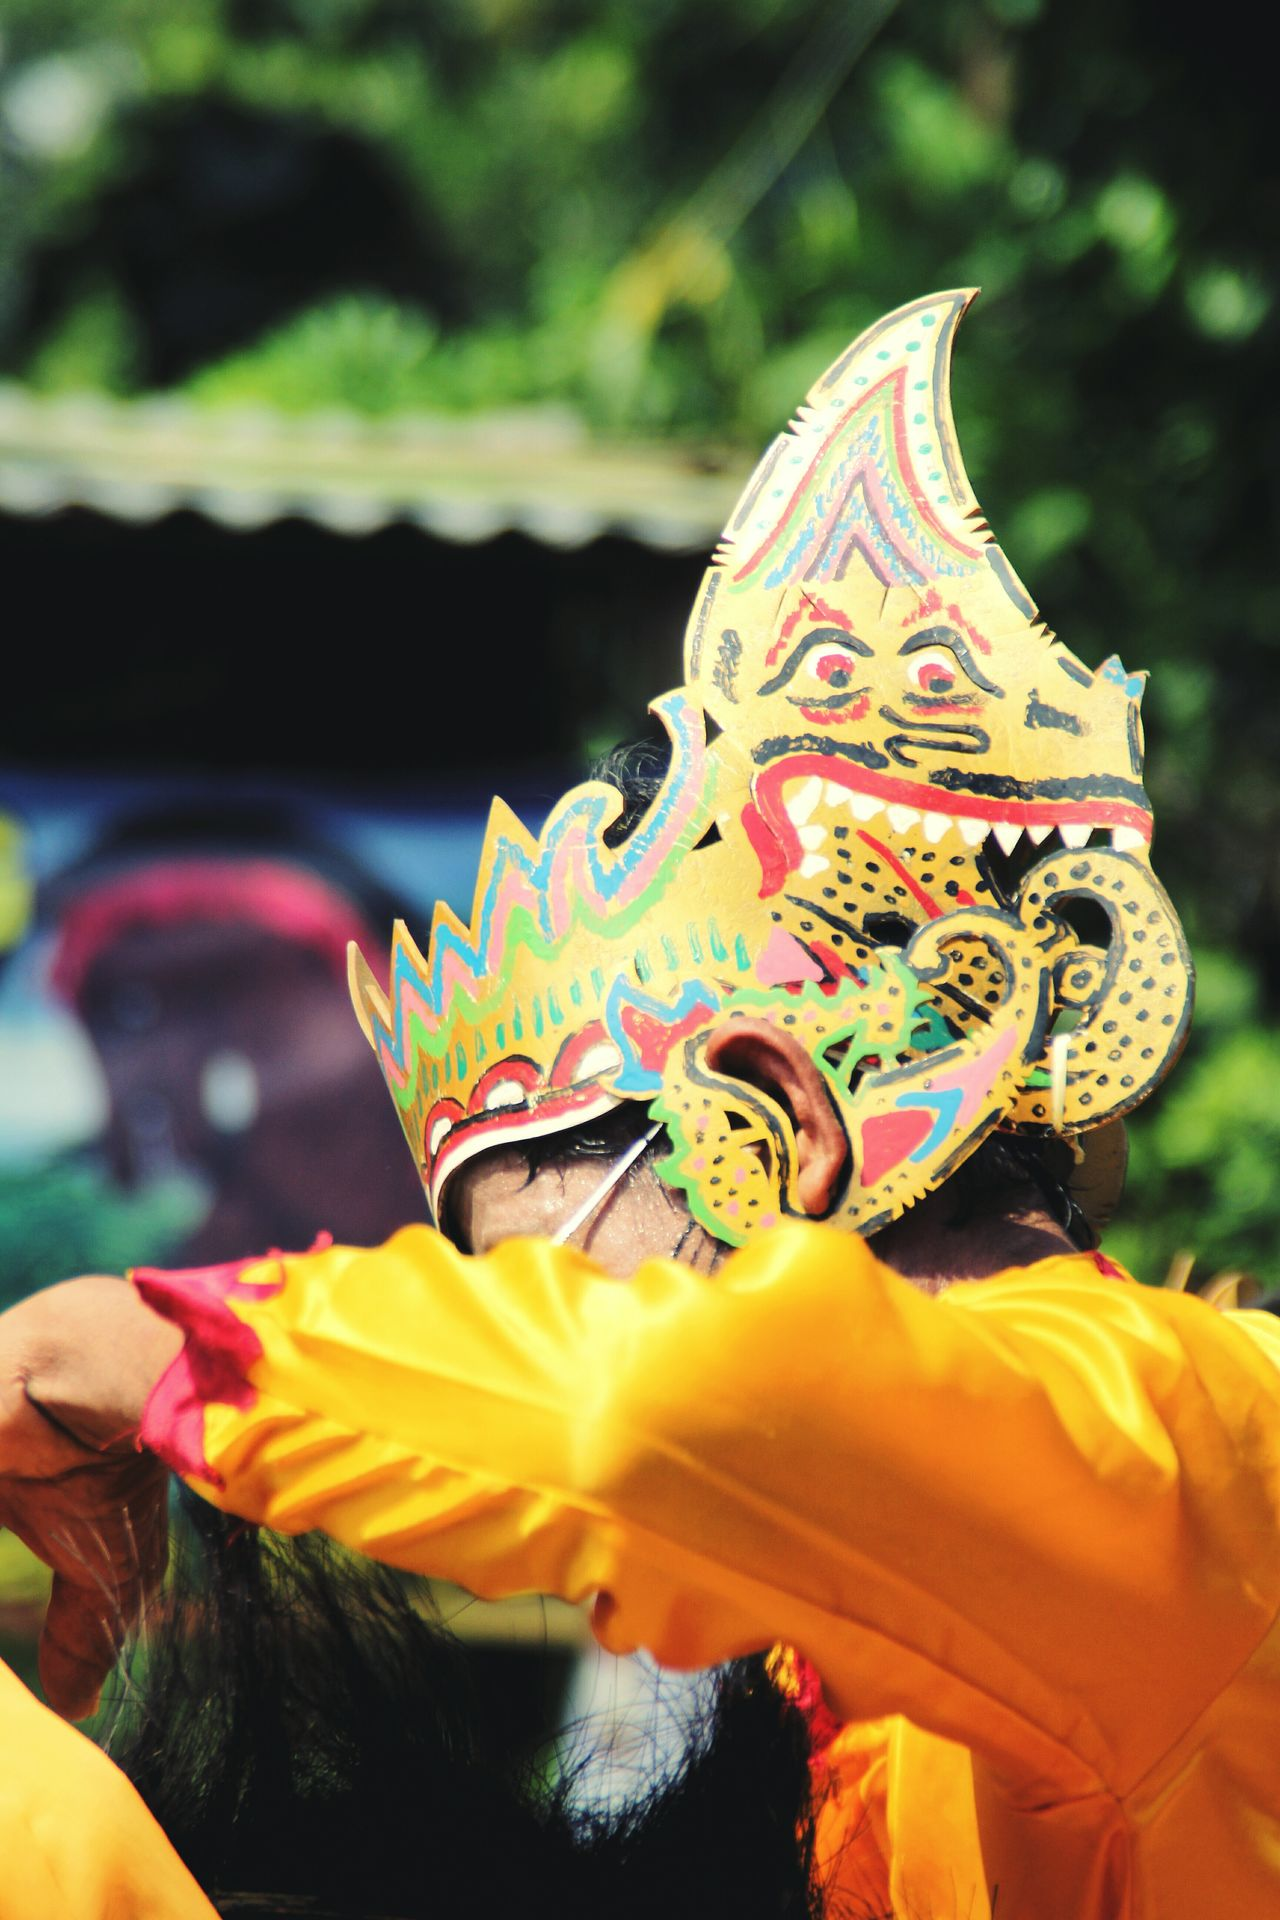 Culture #art #design #arturbain #urban #dessin #peinture #streetart #artderue #graffitti #tag #tags #tagstagramers #mural #murales #wallart #photographer #photography #artvisuel #artvisual Traditionaldance Traditional Culture Indonesia_allshots Indonesia_photography Dance Photography